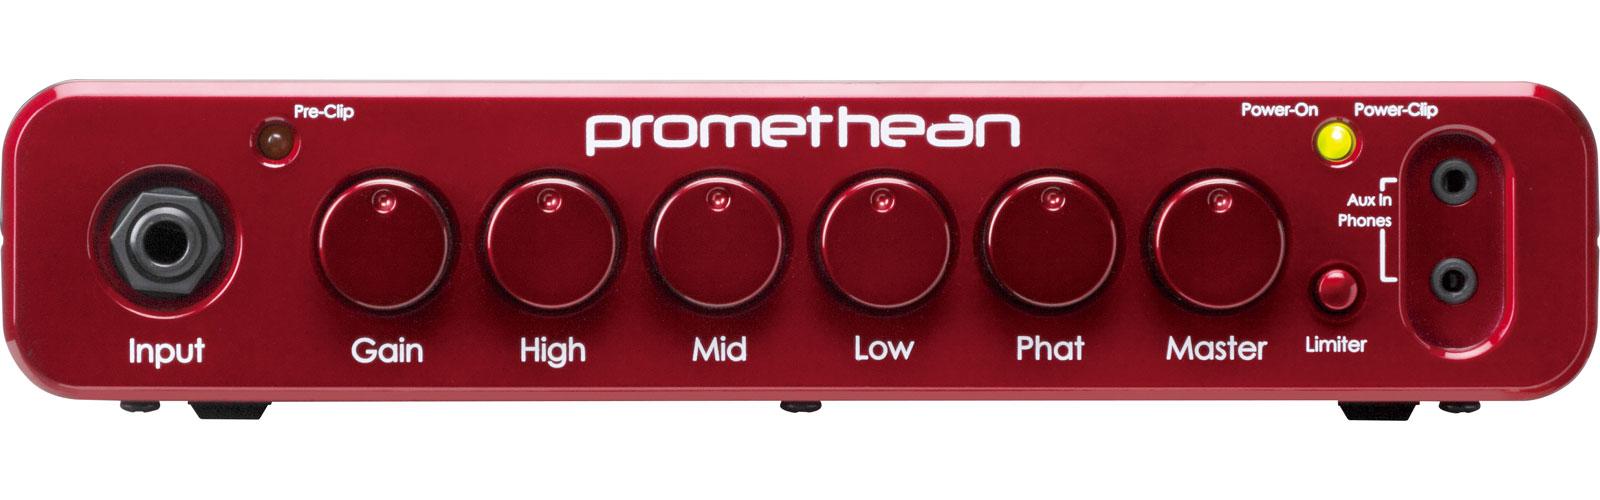 Ibanez Bass Amplifier Head Promethean P300h